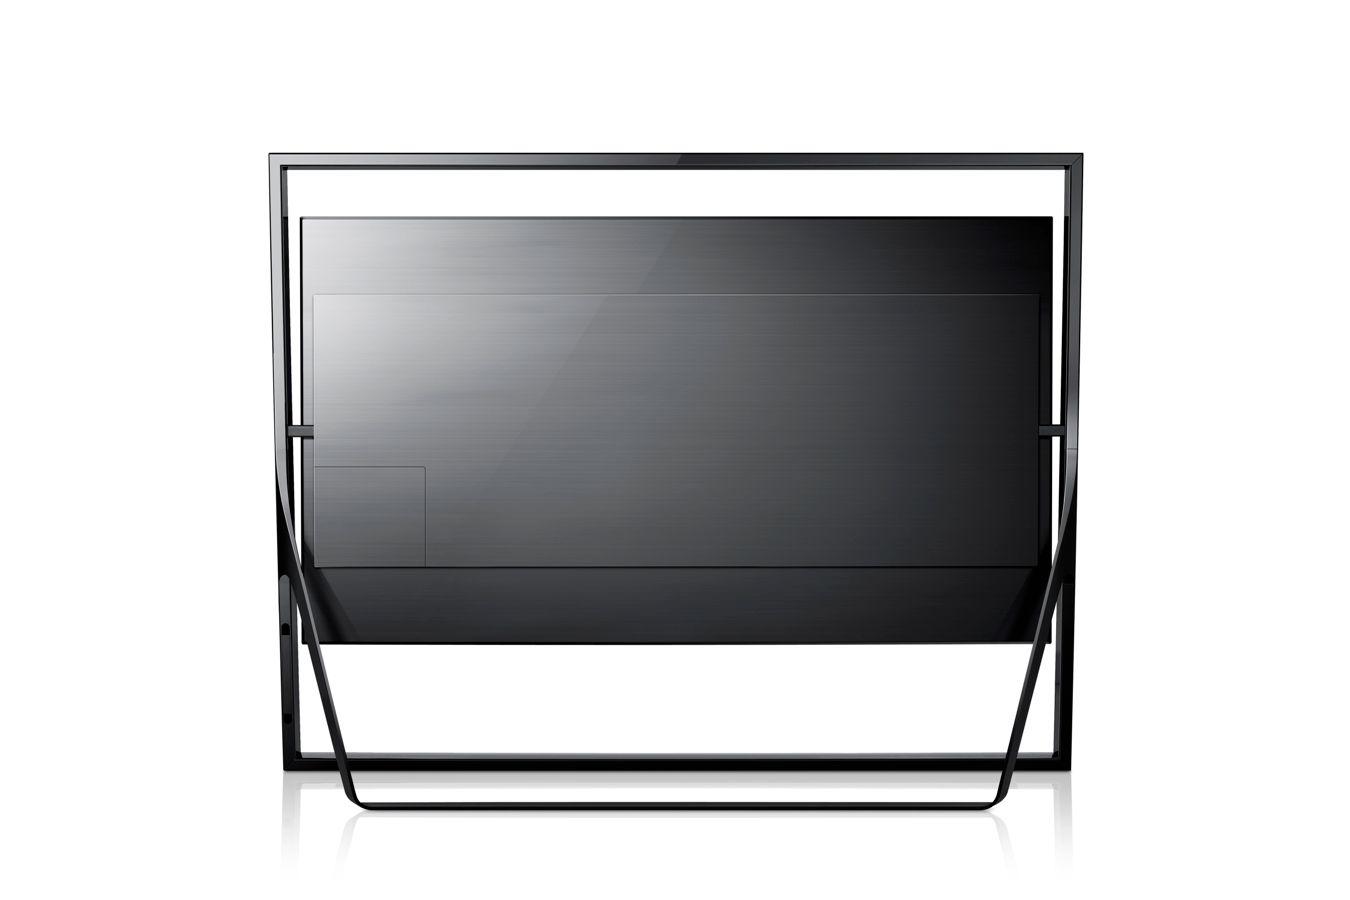 Samsung nye TV, S9000